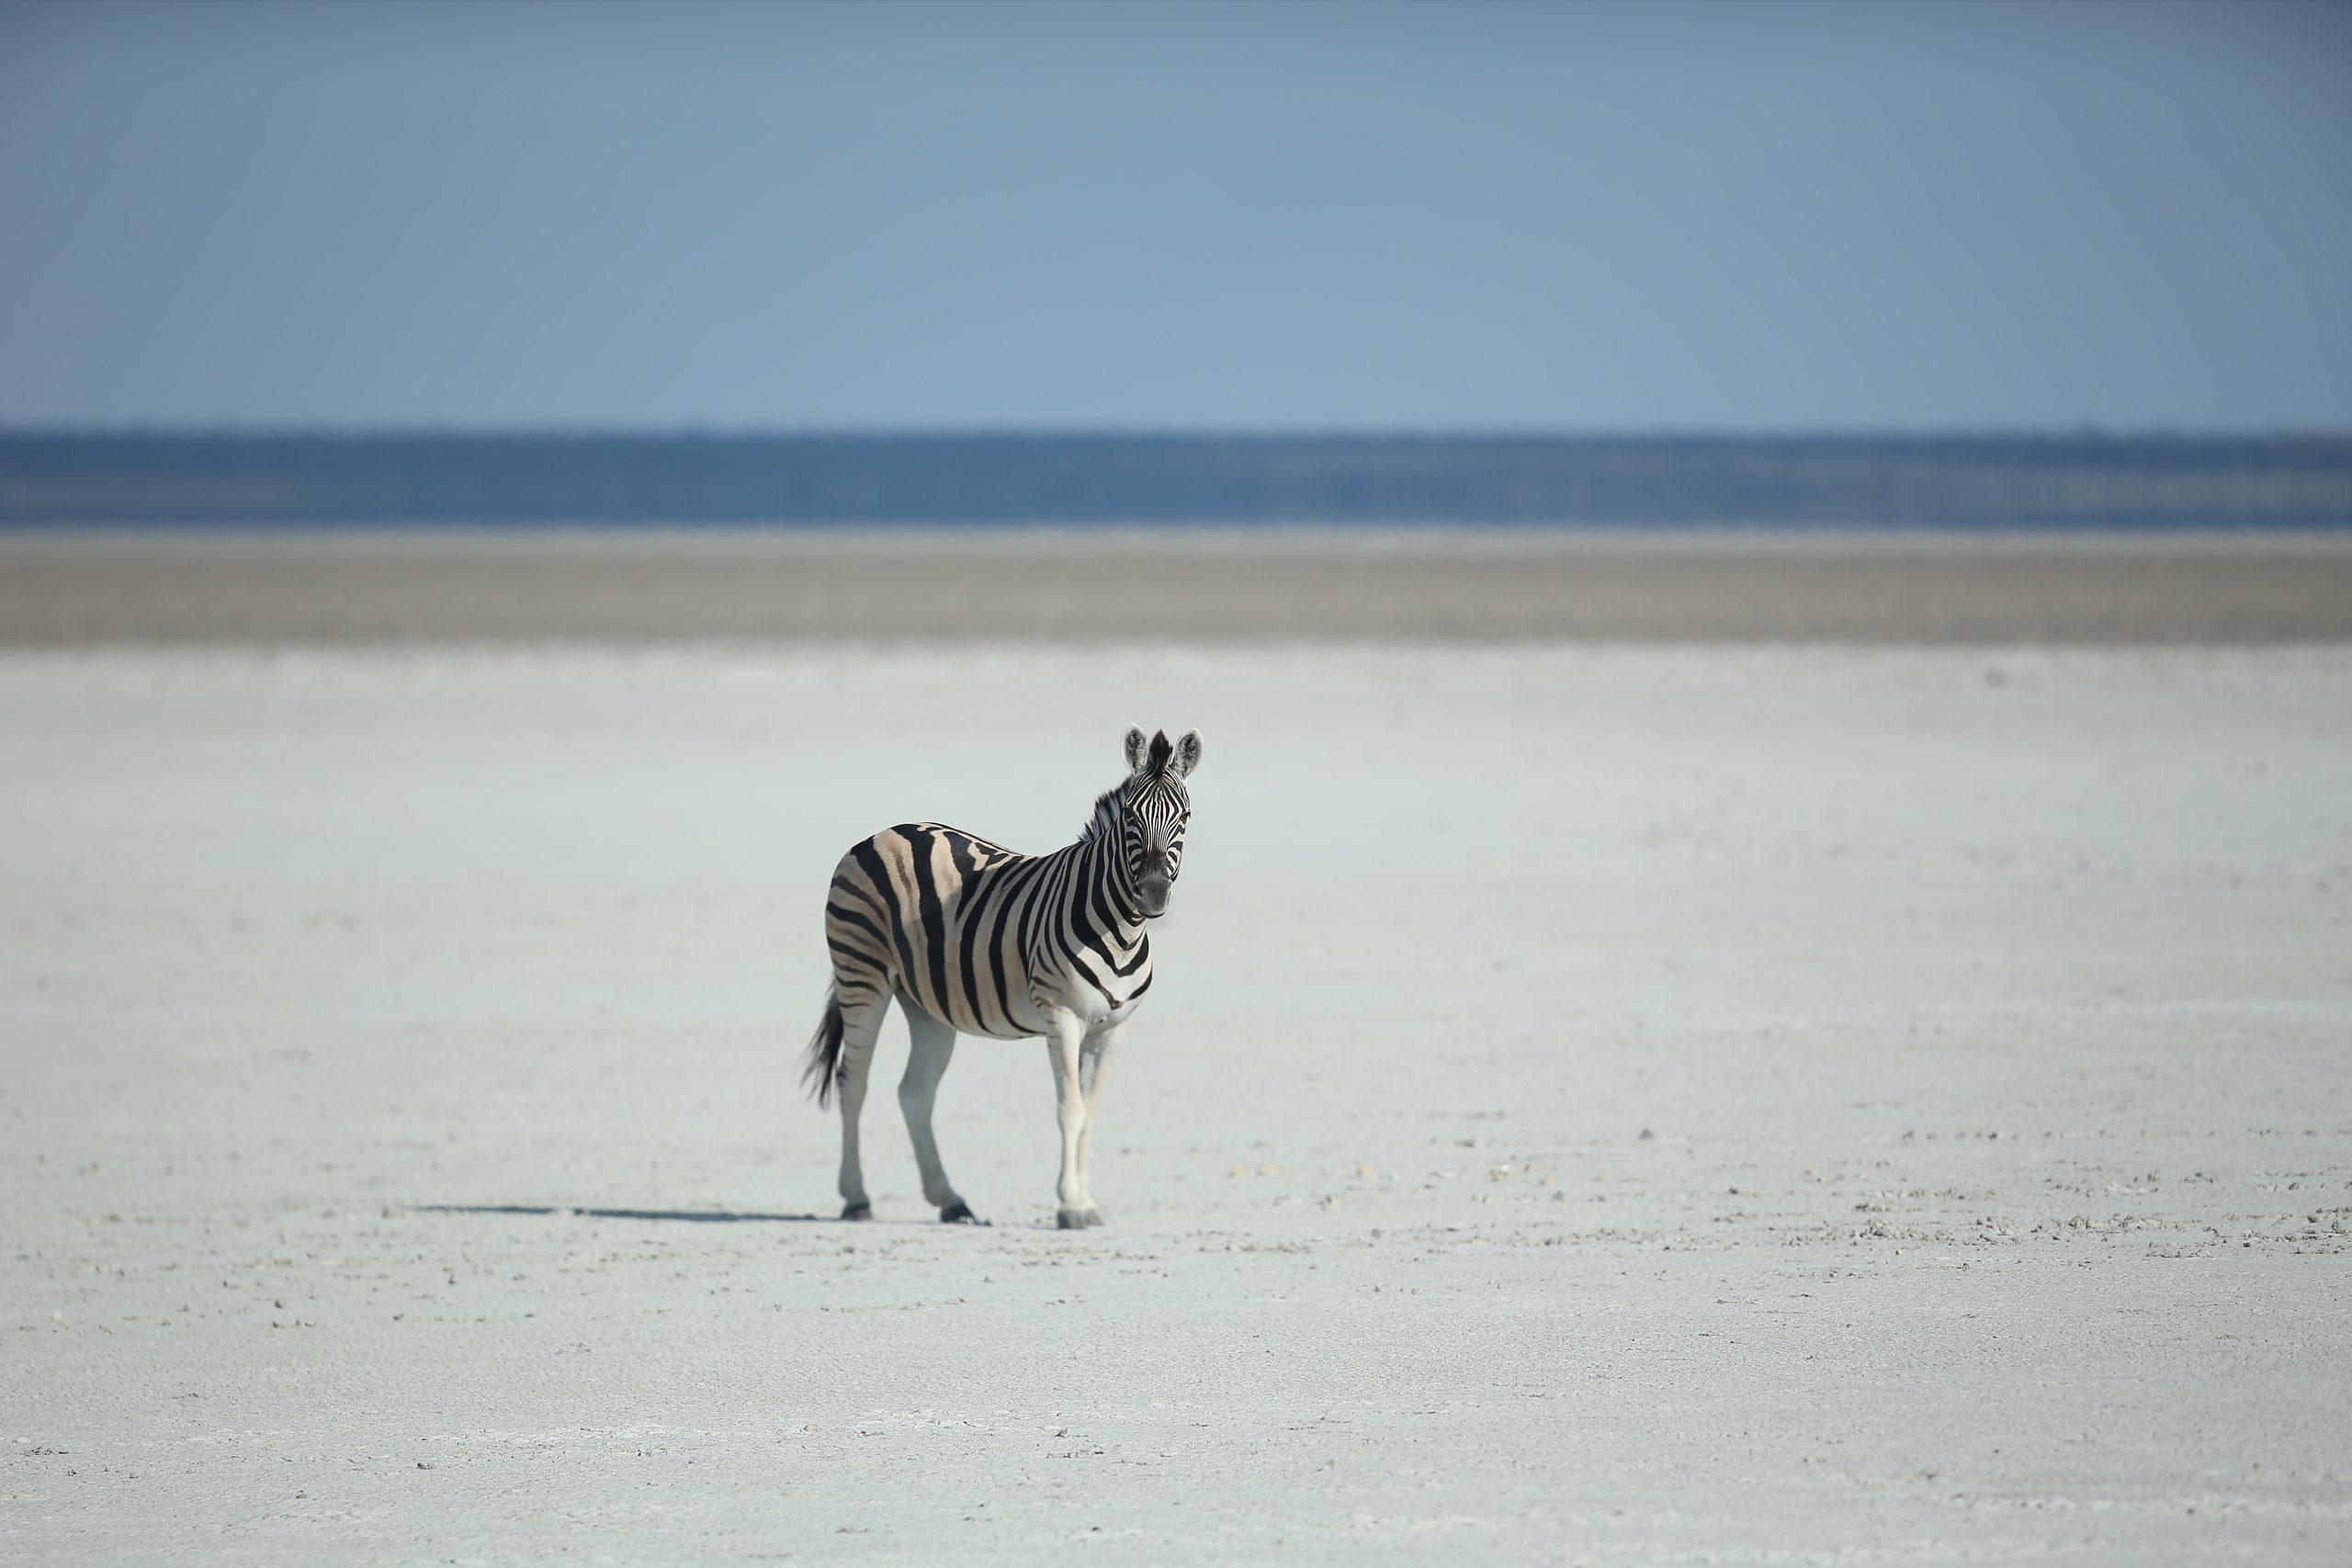 ZEBRA ON THE BEACH